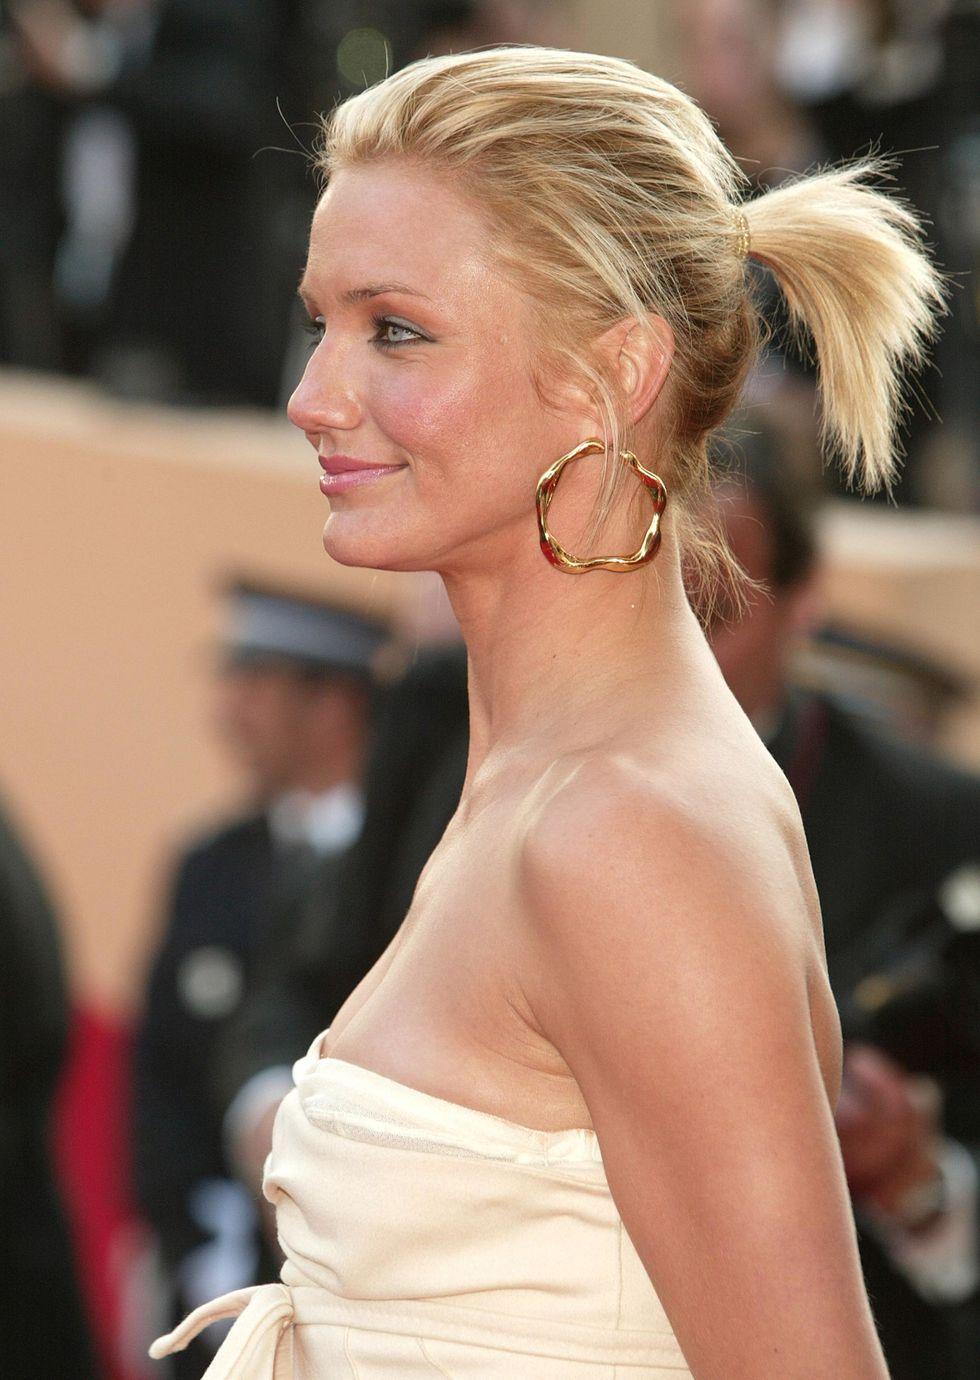 Hair, Hairstyle, Blond, Shoulder, Chignon, Beauty, Skin, Long Hair, Premiere, Chin,